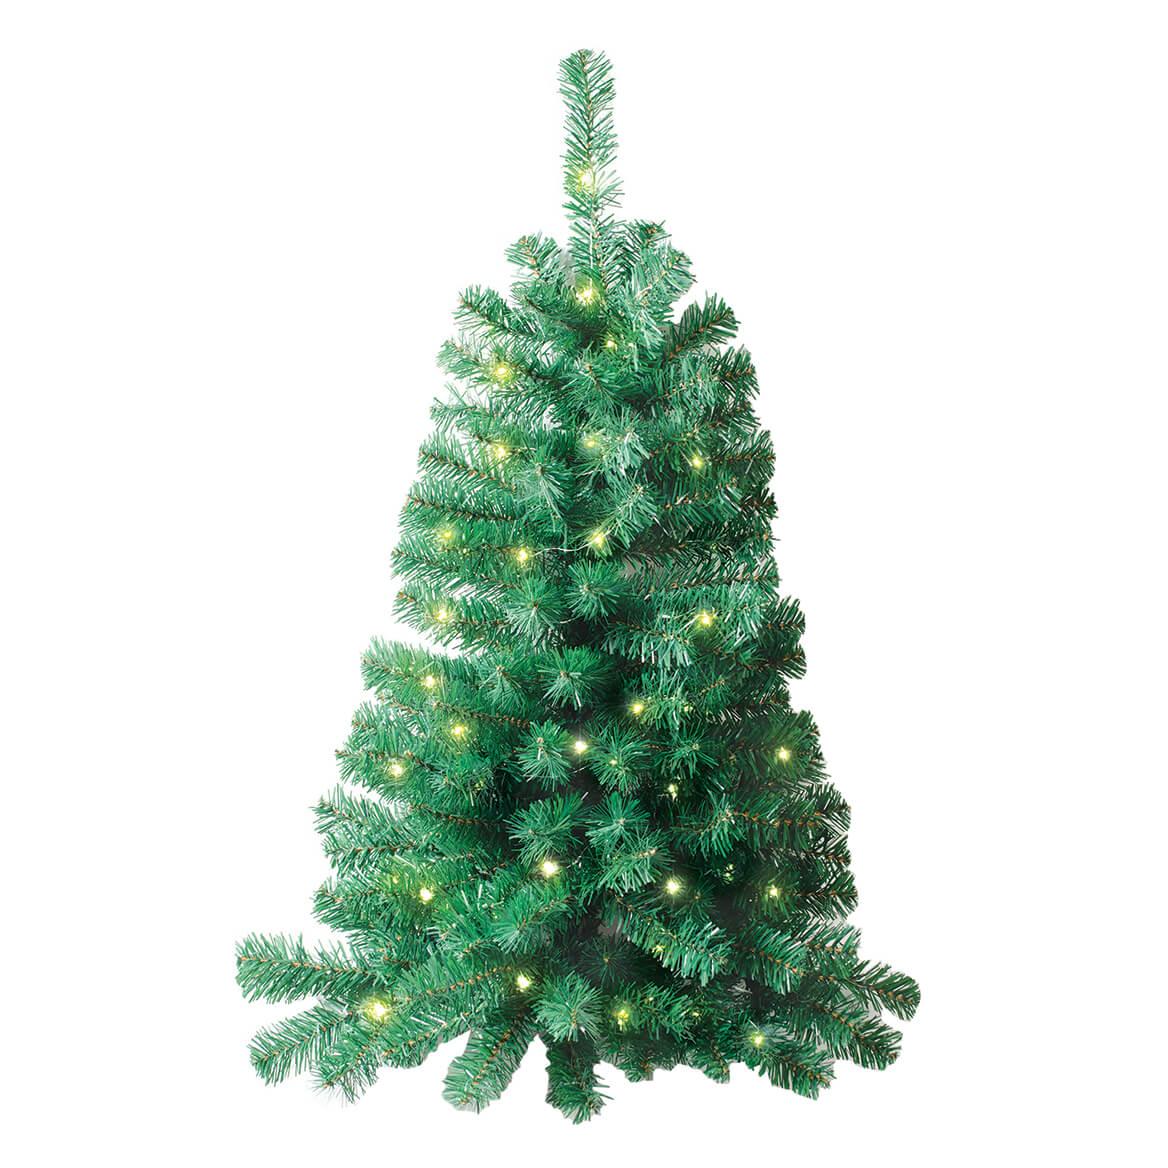 Wall Christmas Trees.Christmas Trees Decorated Tabletop Christmas Trees